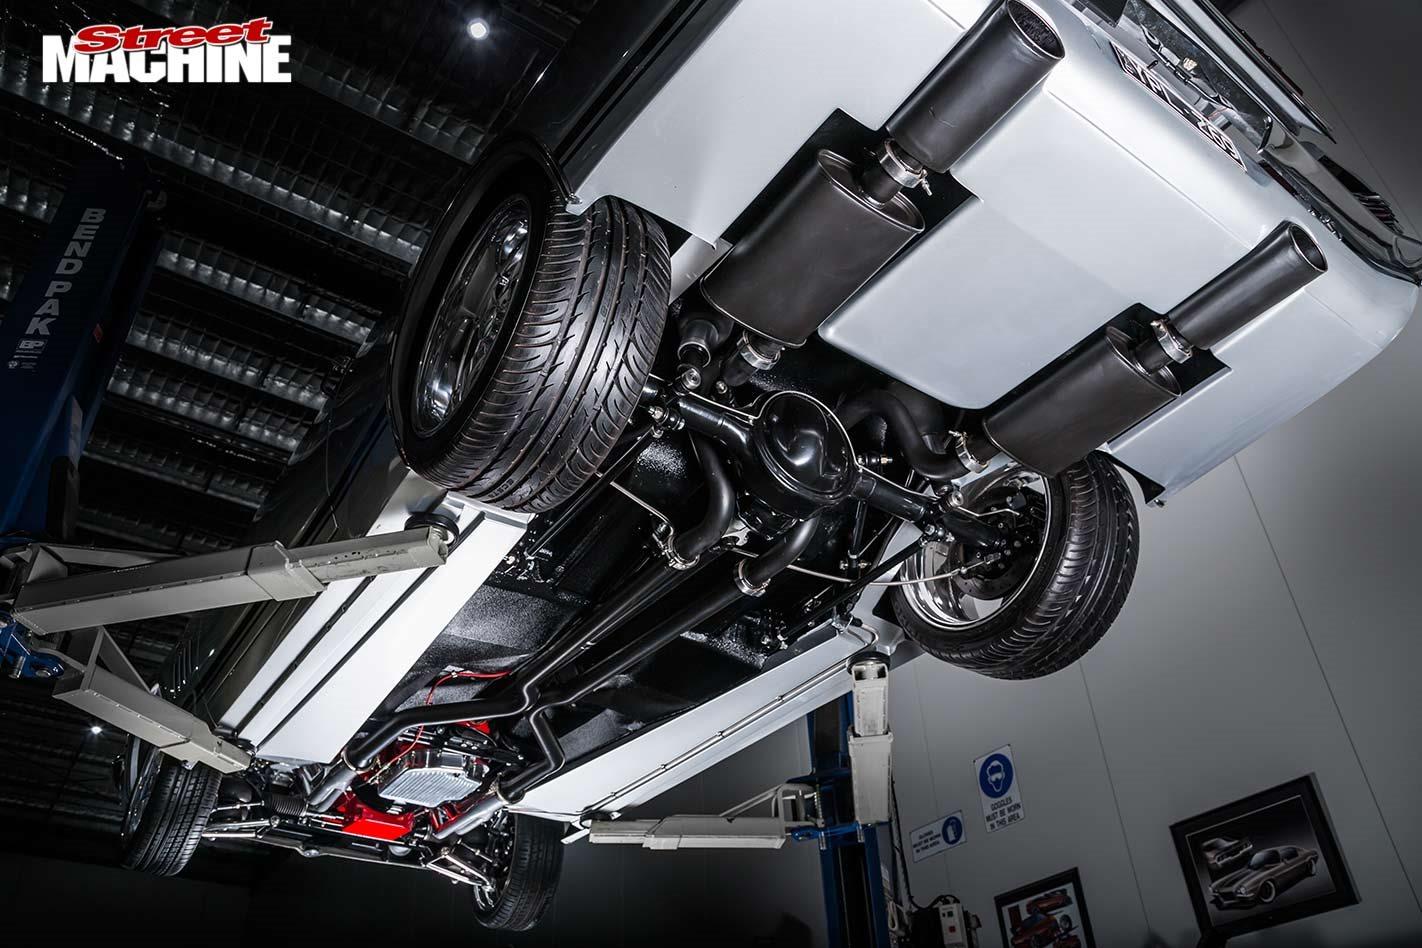 Holden HK Monaro underside